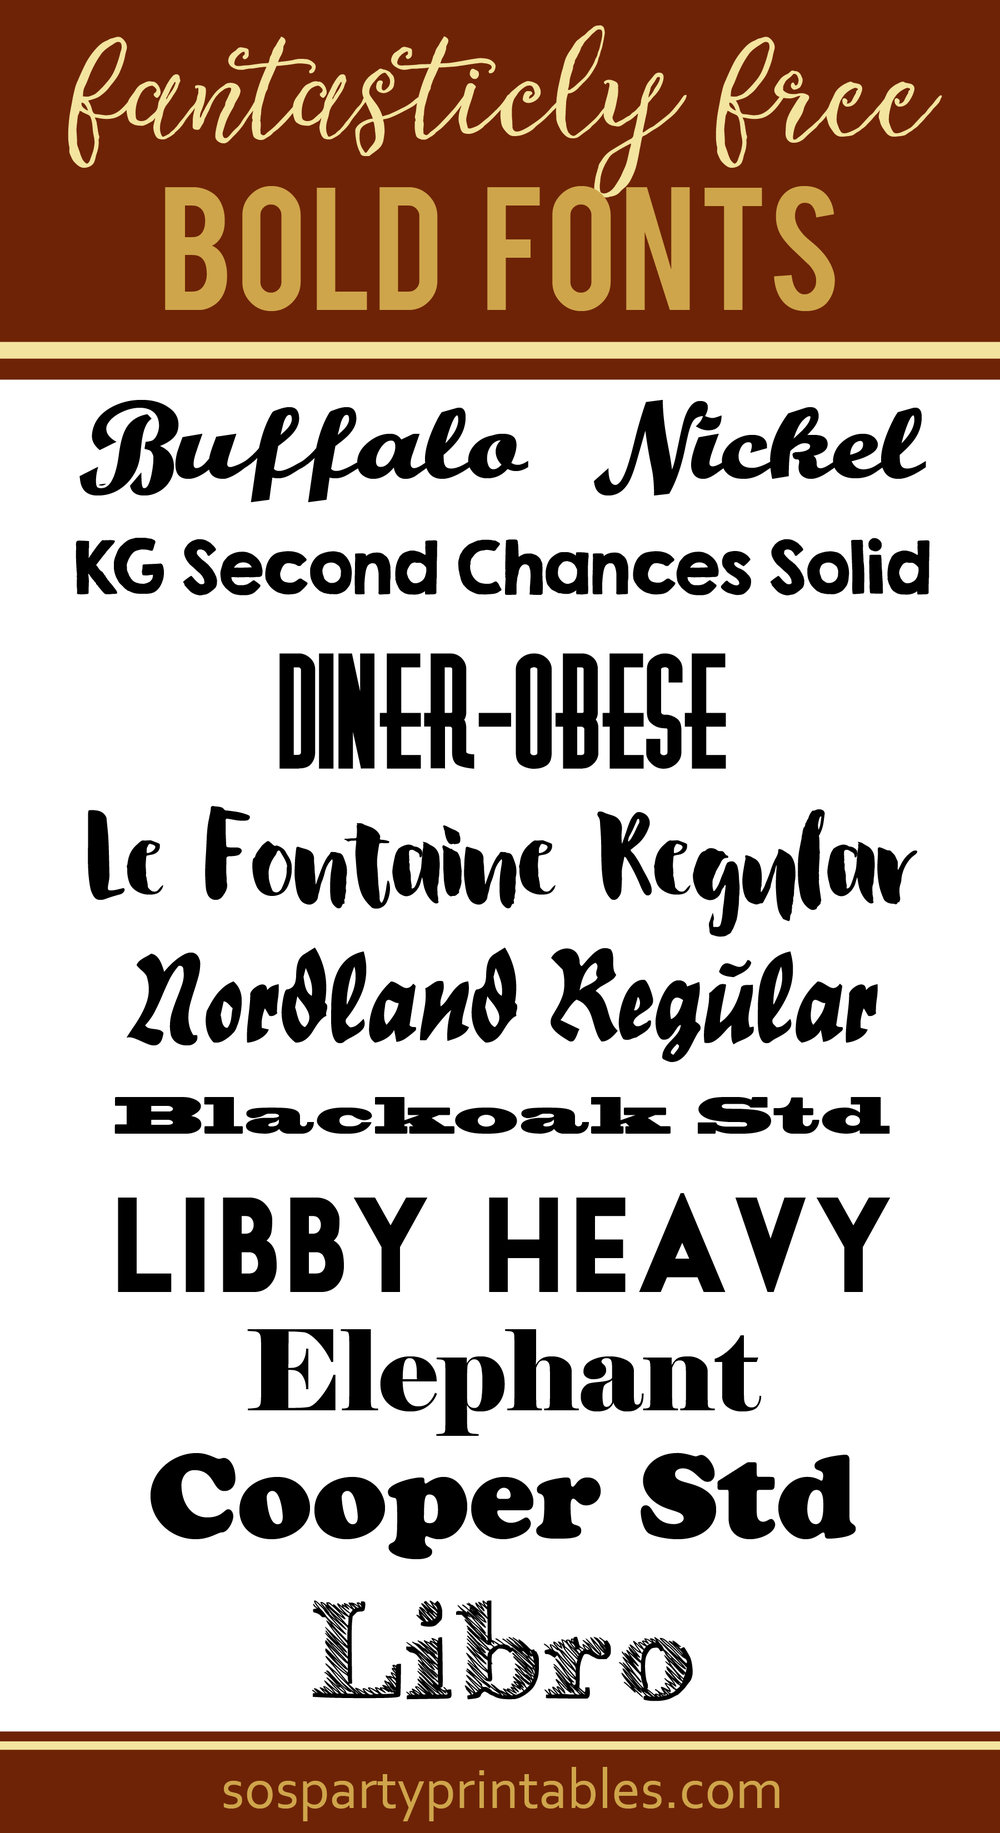 bold fonts-01.jpg